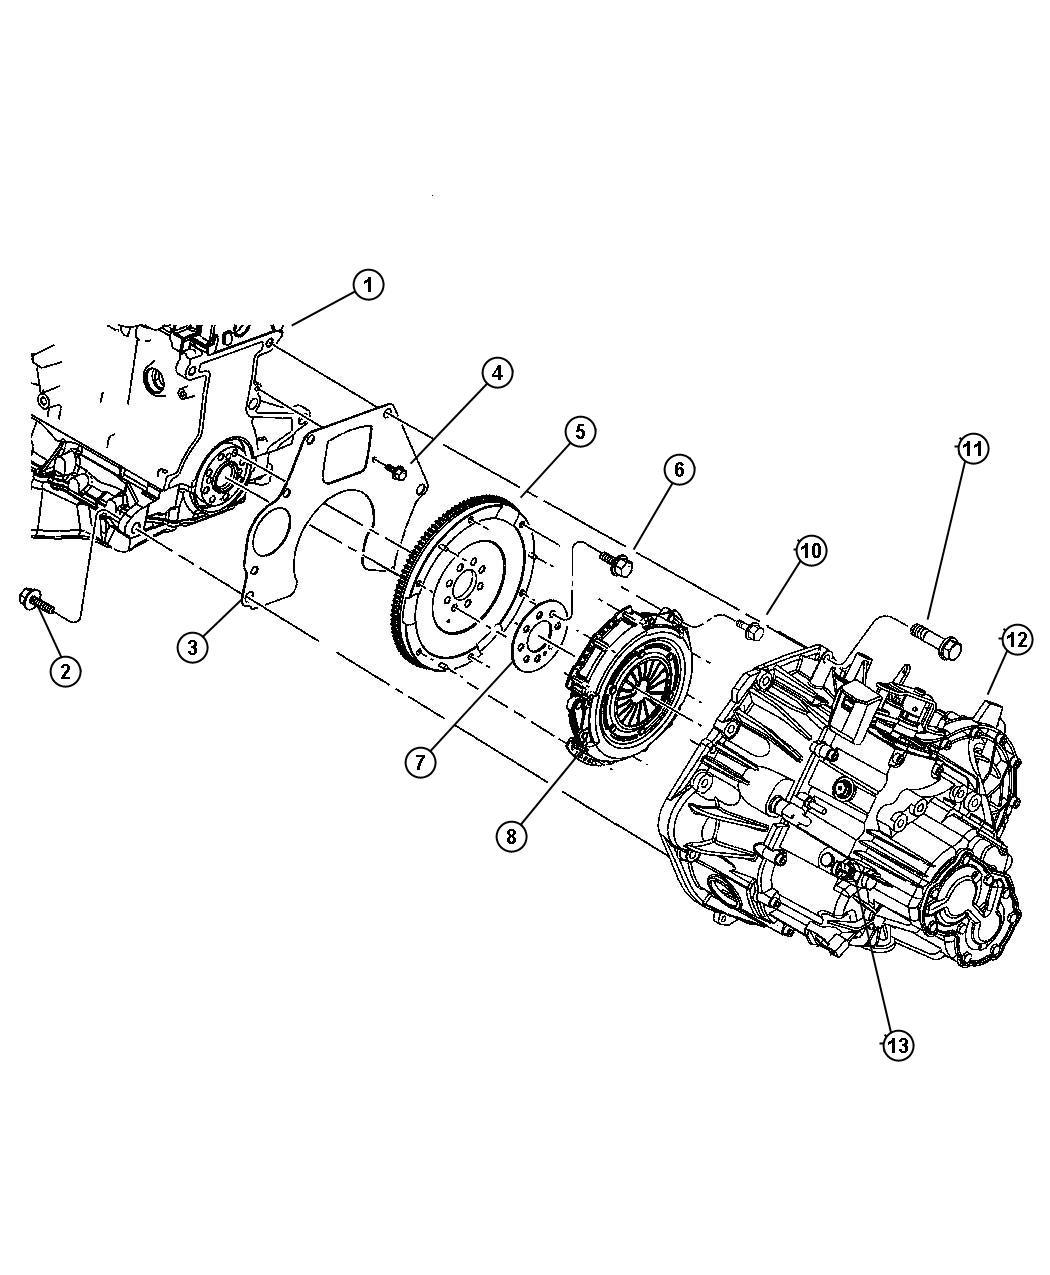 2007 Chrysler PT Cruiser Clutch kit. Manual transmission